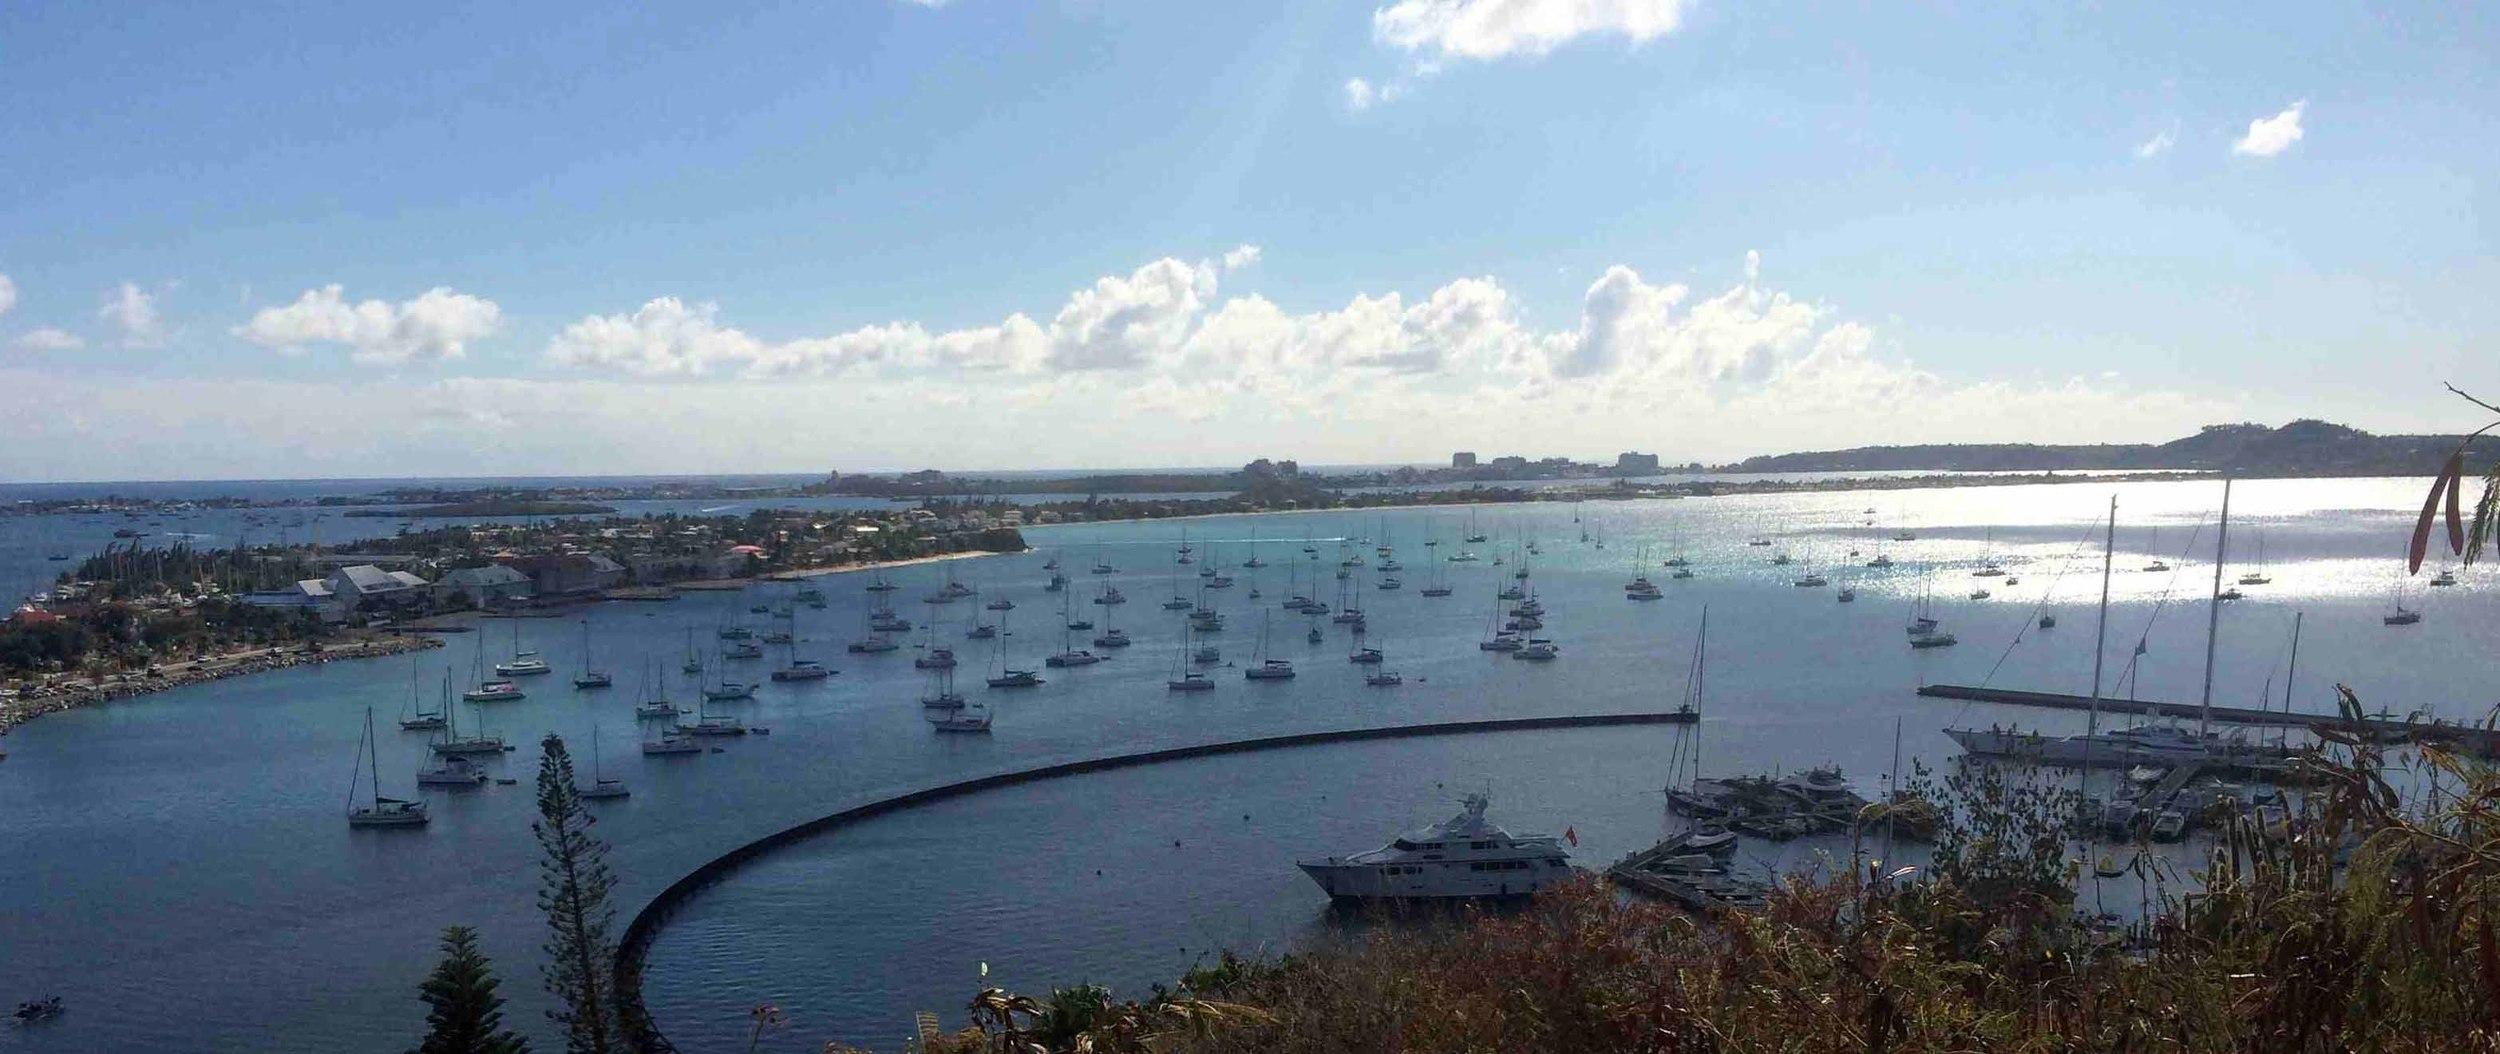 Overlooking Marigot Bay, St. Martin